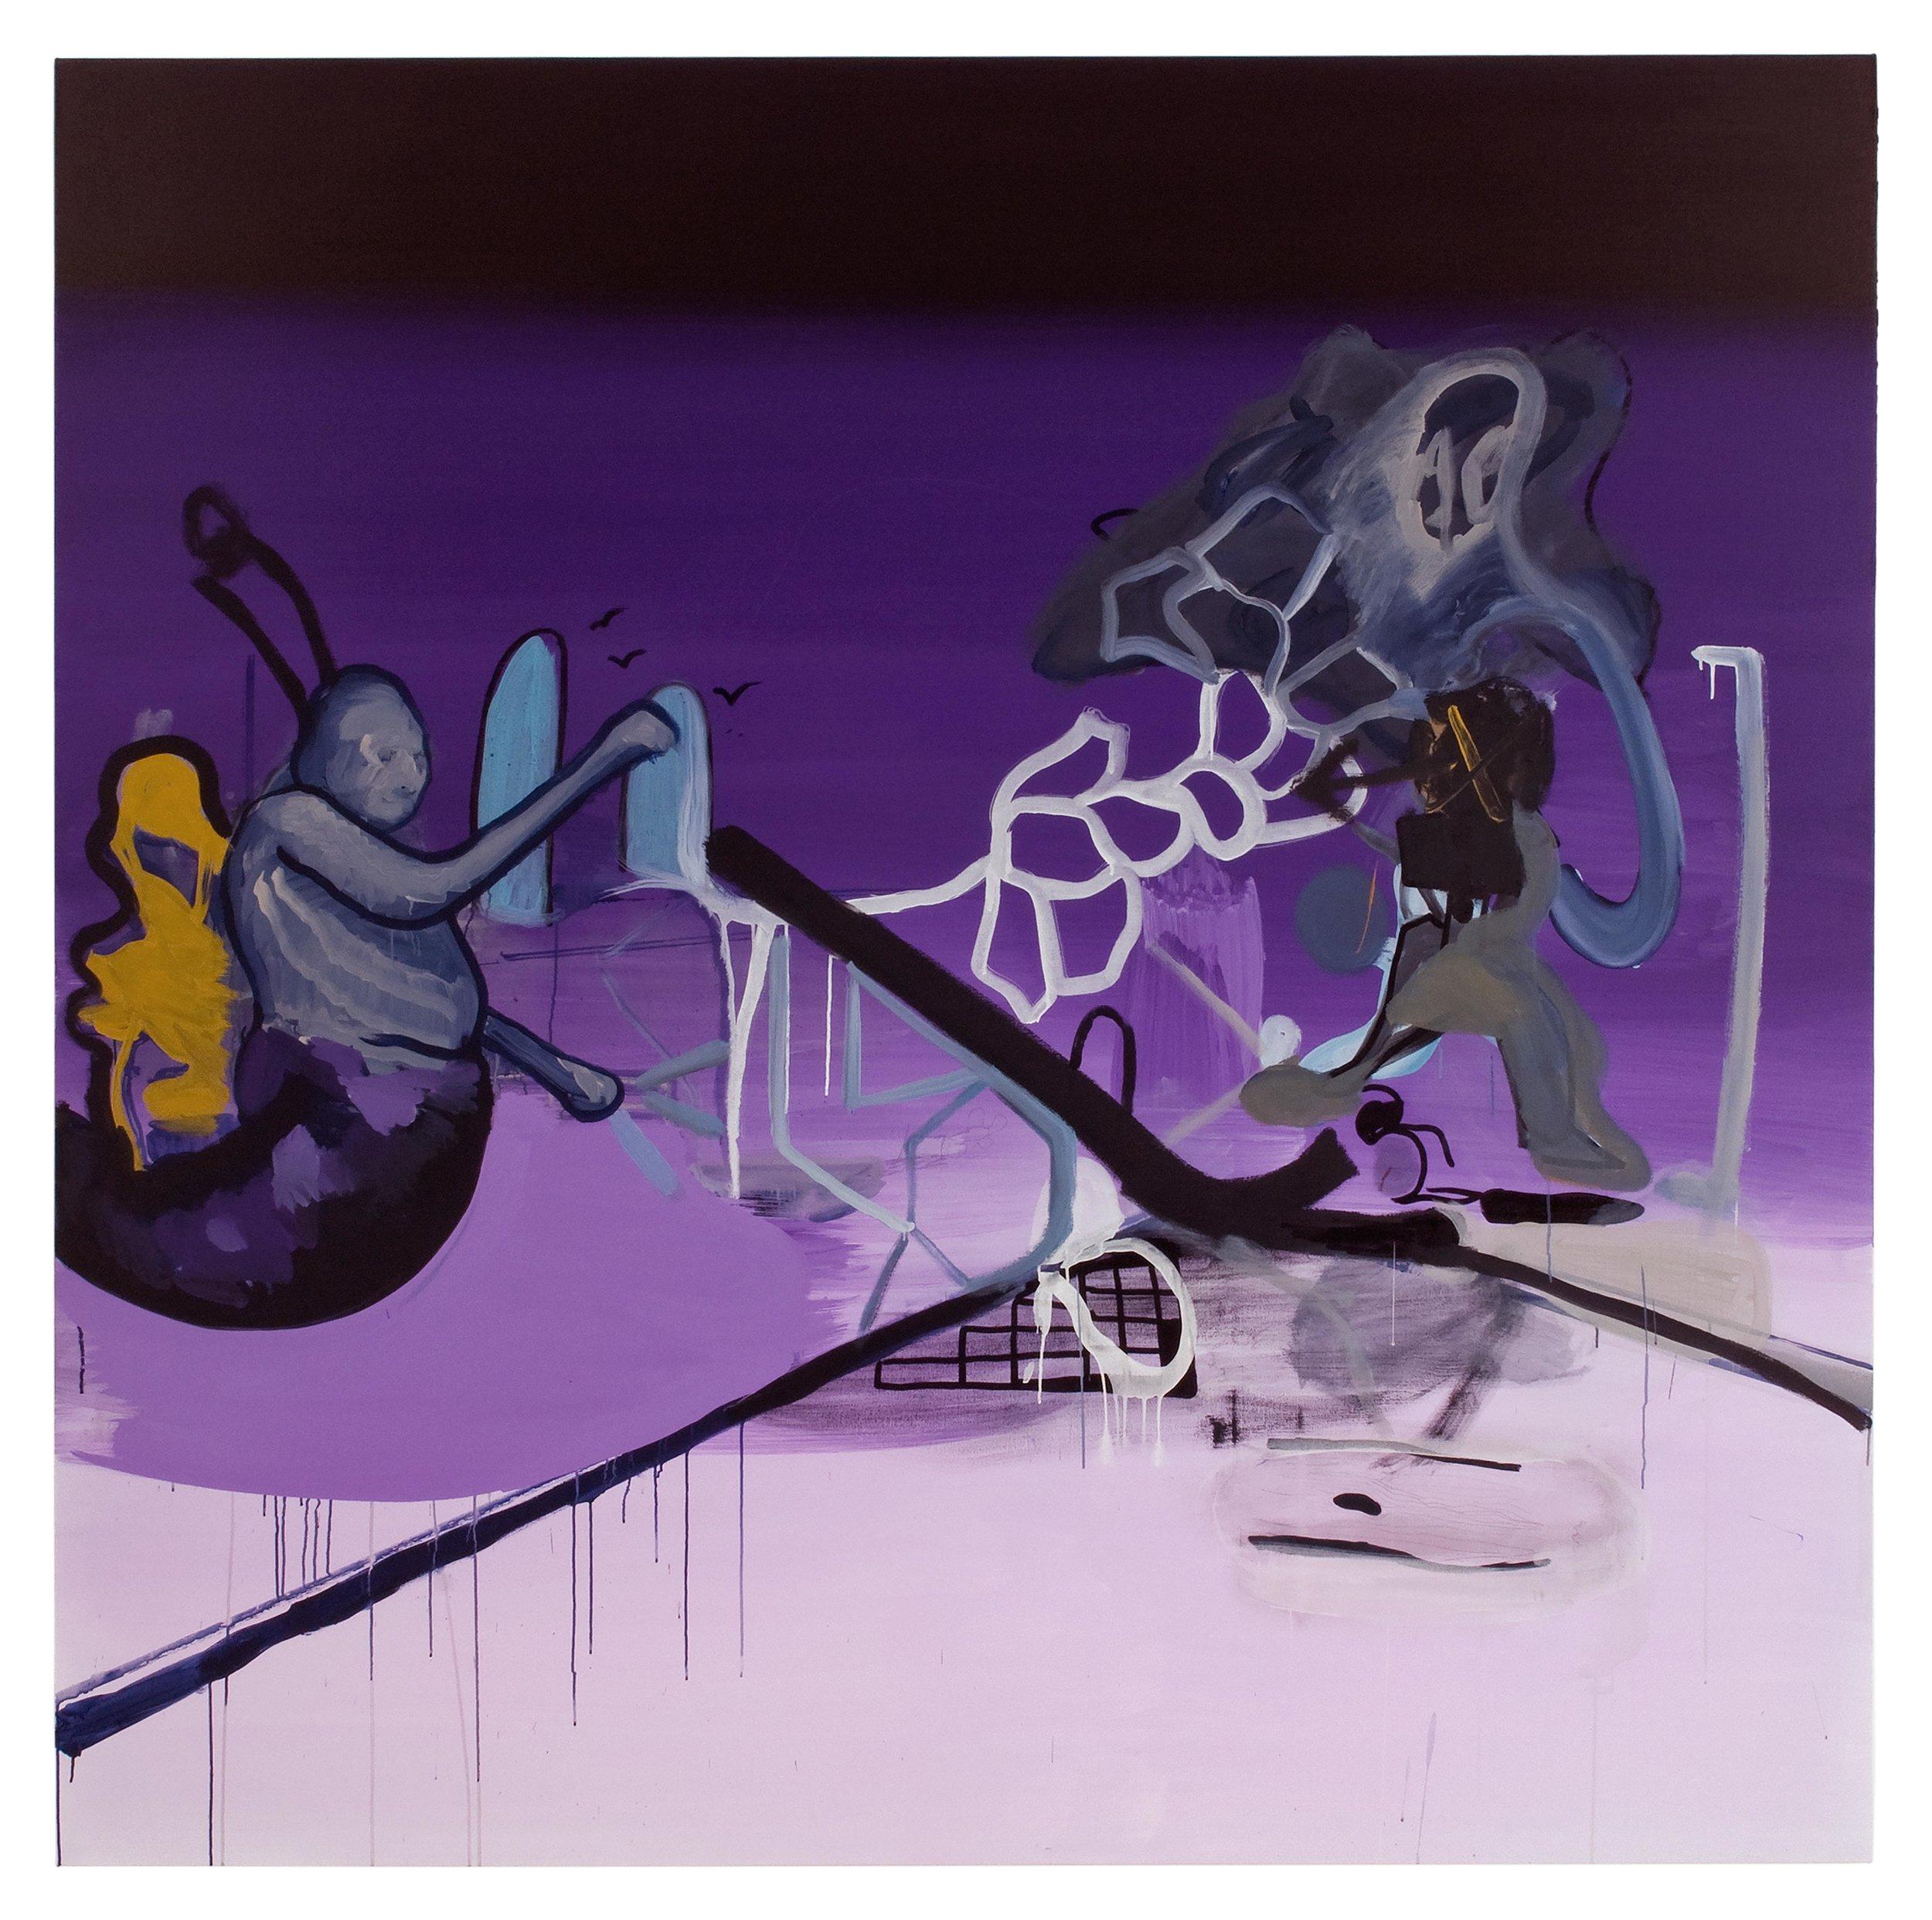 Drew Beattie  The Room  2010 acrylic on canvas 96 x 96 inches